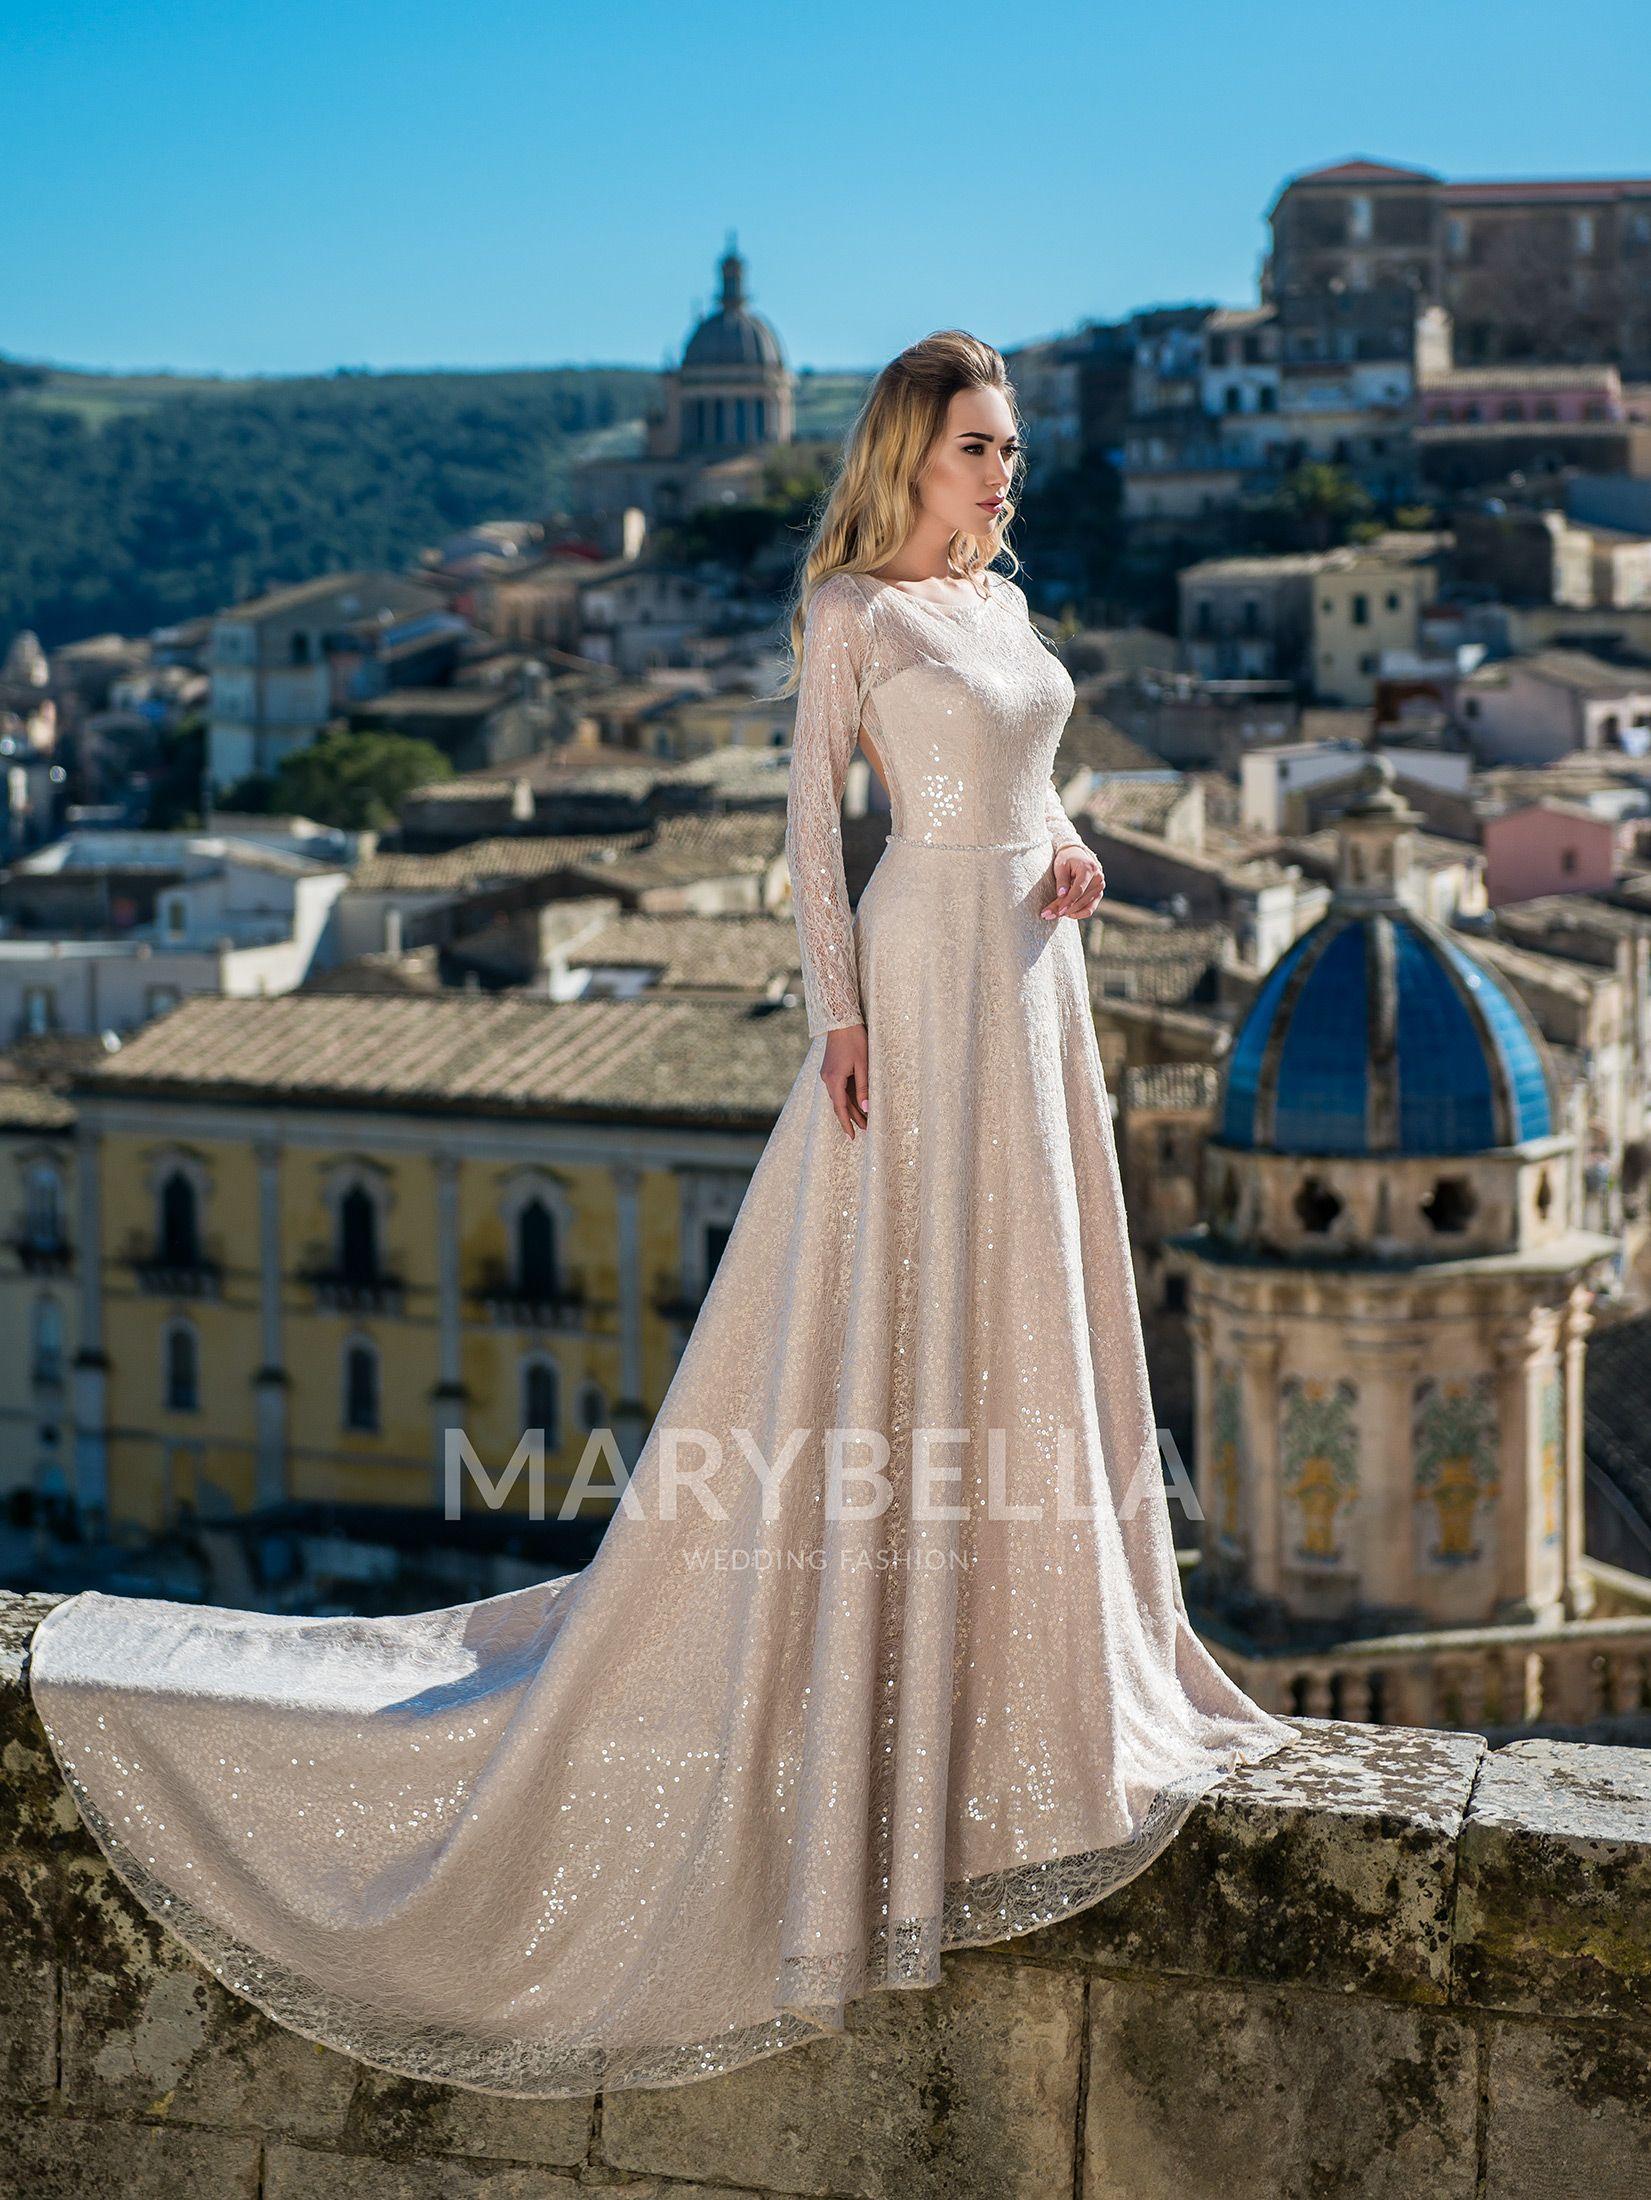 Marbella wedding dress in Charmé Gaby wedding dresses boutique in